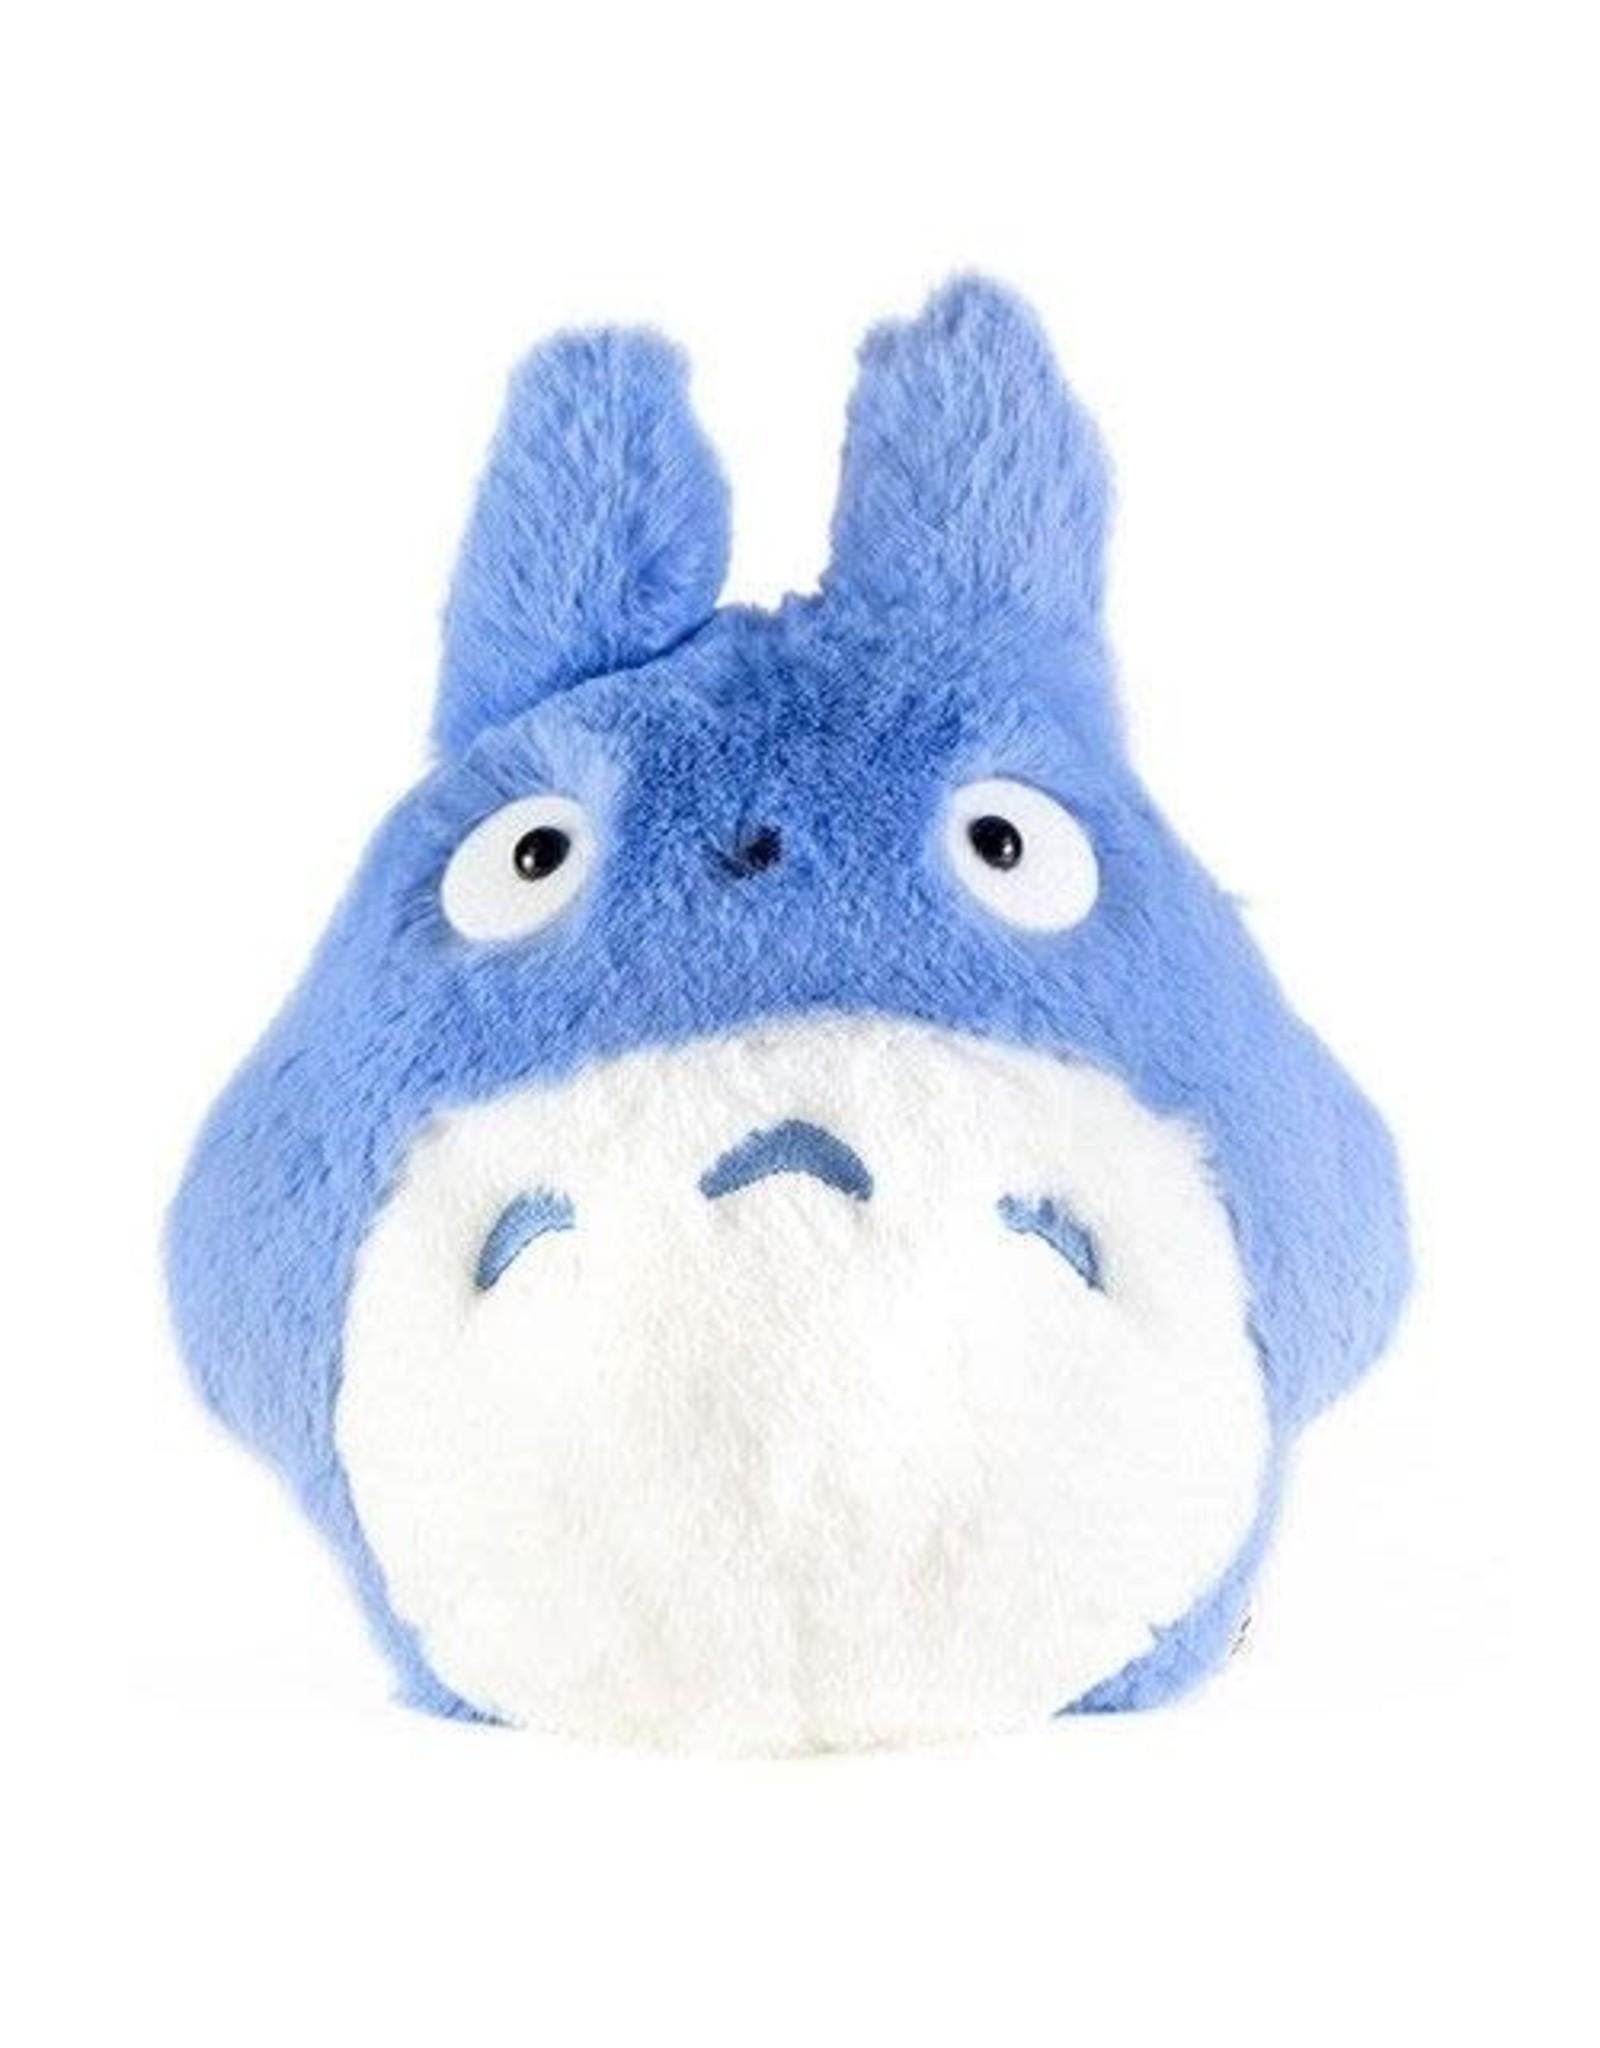 Studio Ghibli Plush - My Neighbor Totoro - Blue Totoro Nakayoshi Plush Figure - 18 cm